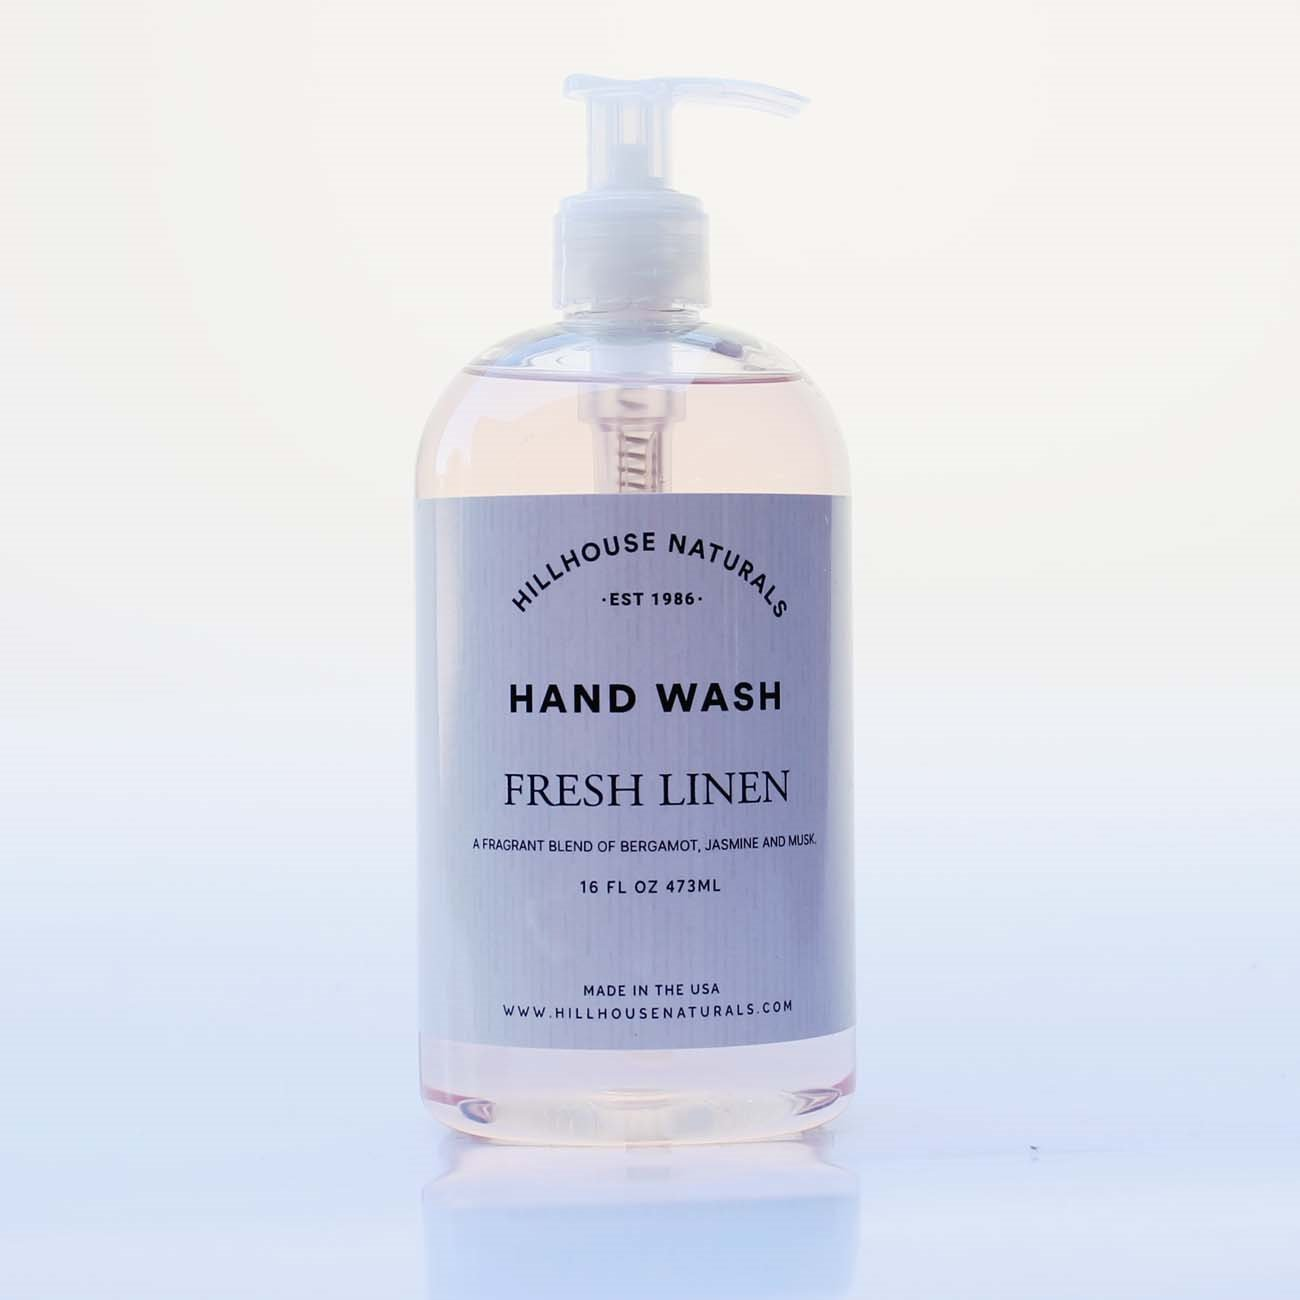 Fresh Linen Hand Wash 16 oz by Hillhouse Naturals